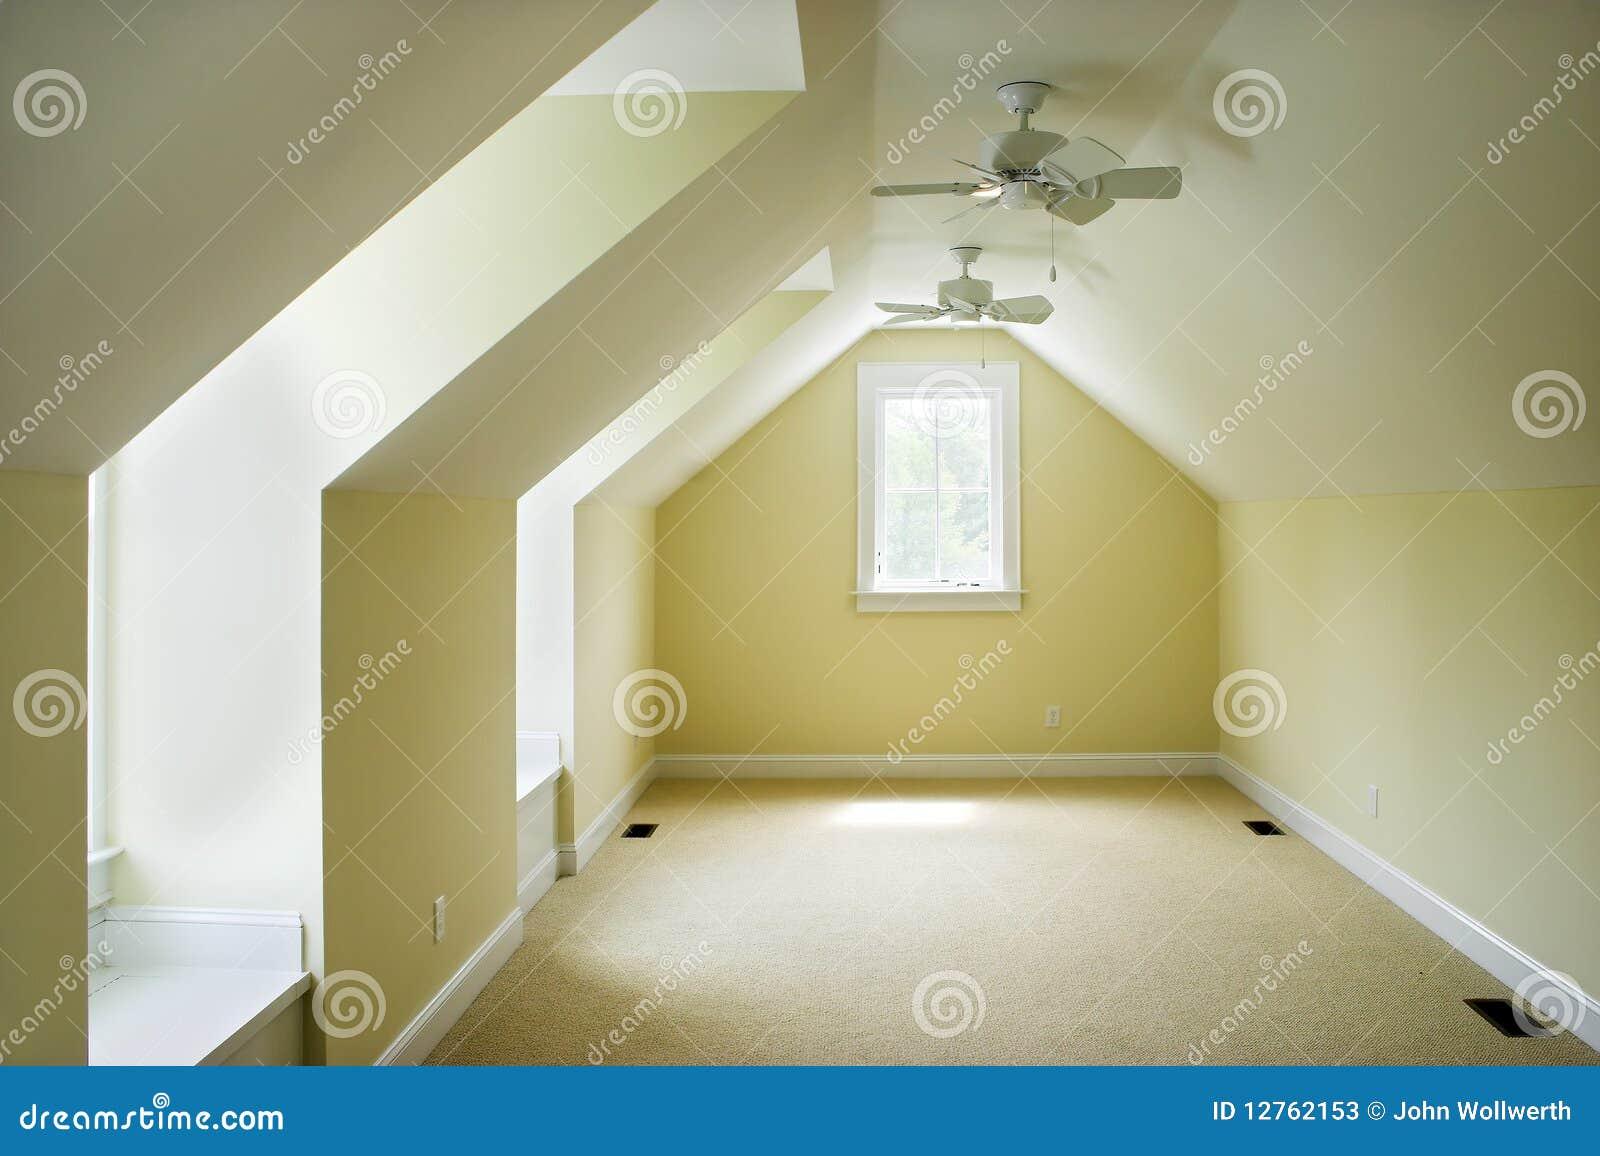 Chambre coucher vide de grenier photos stock image for Chambre vide